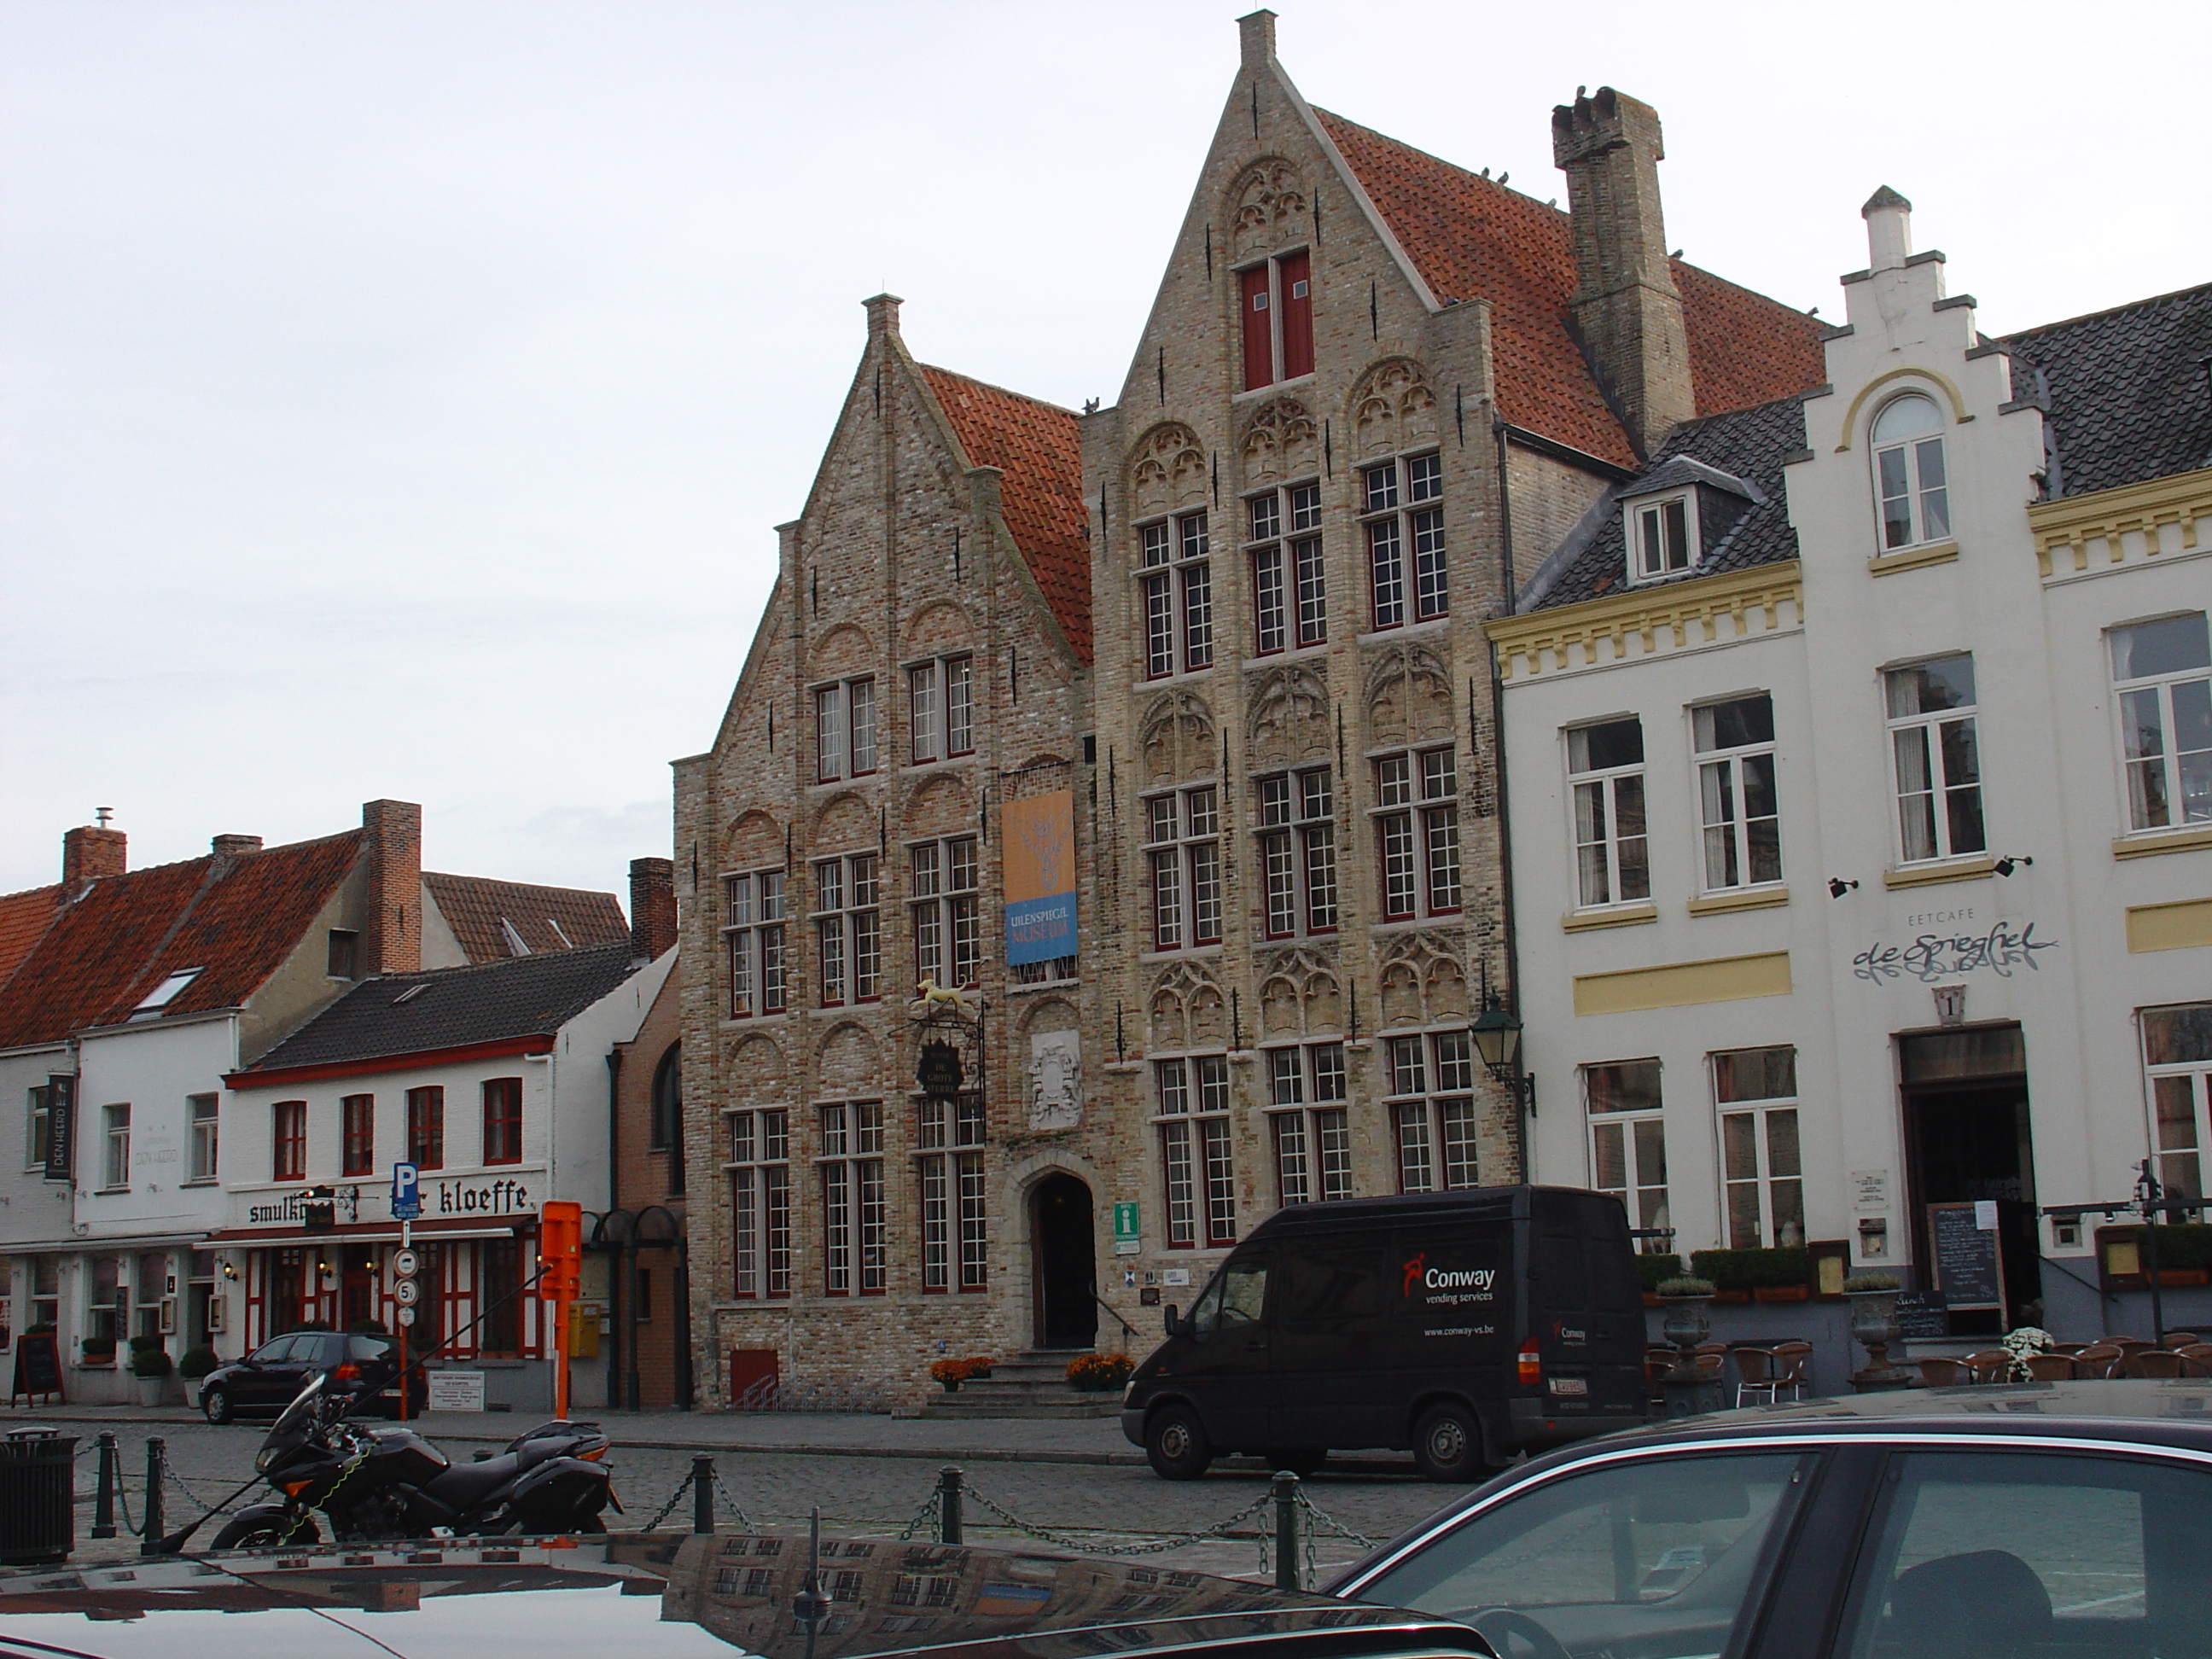 leonievdgulik gent street Belgium cars buildings